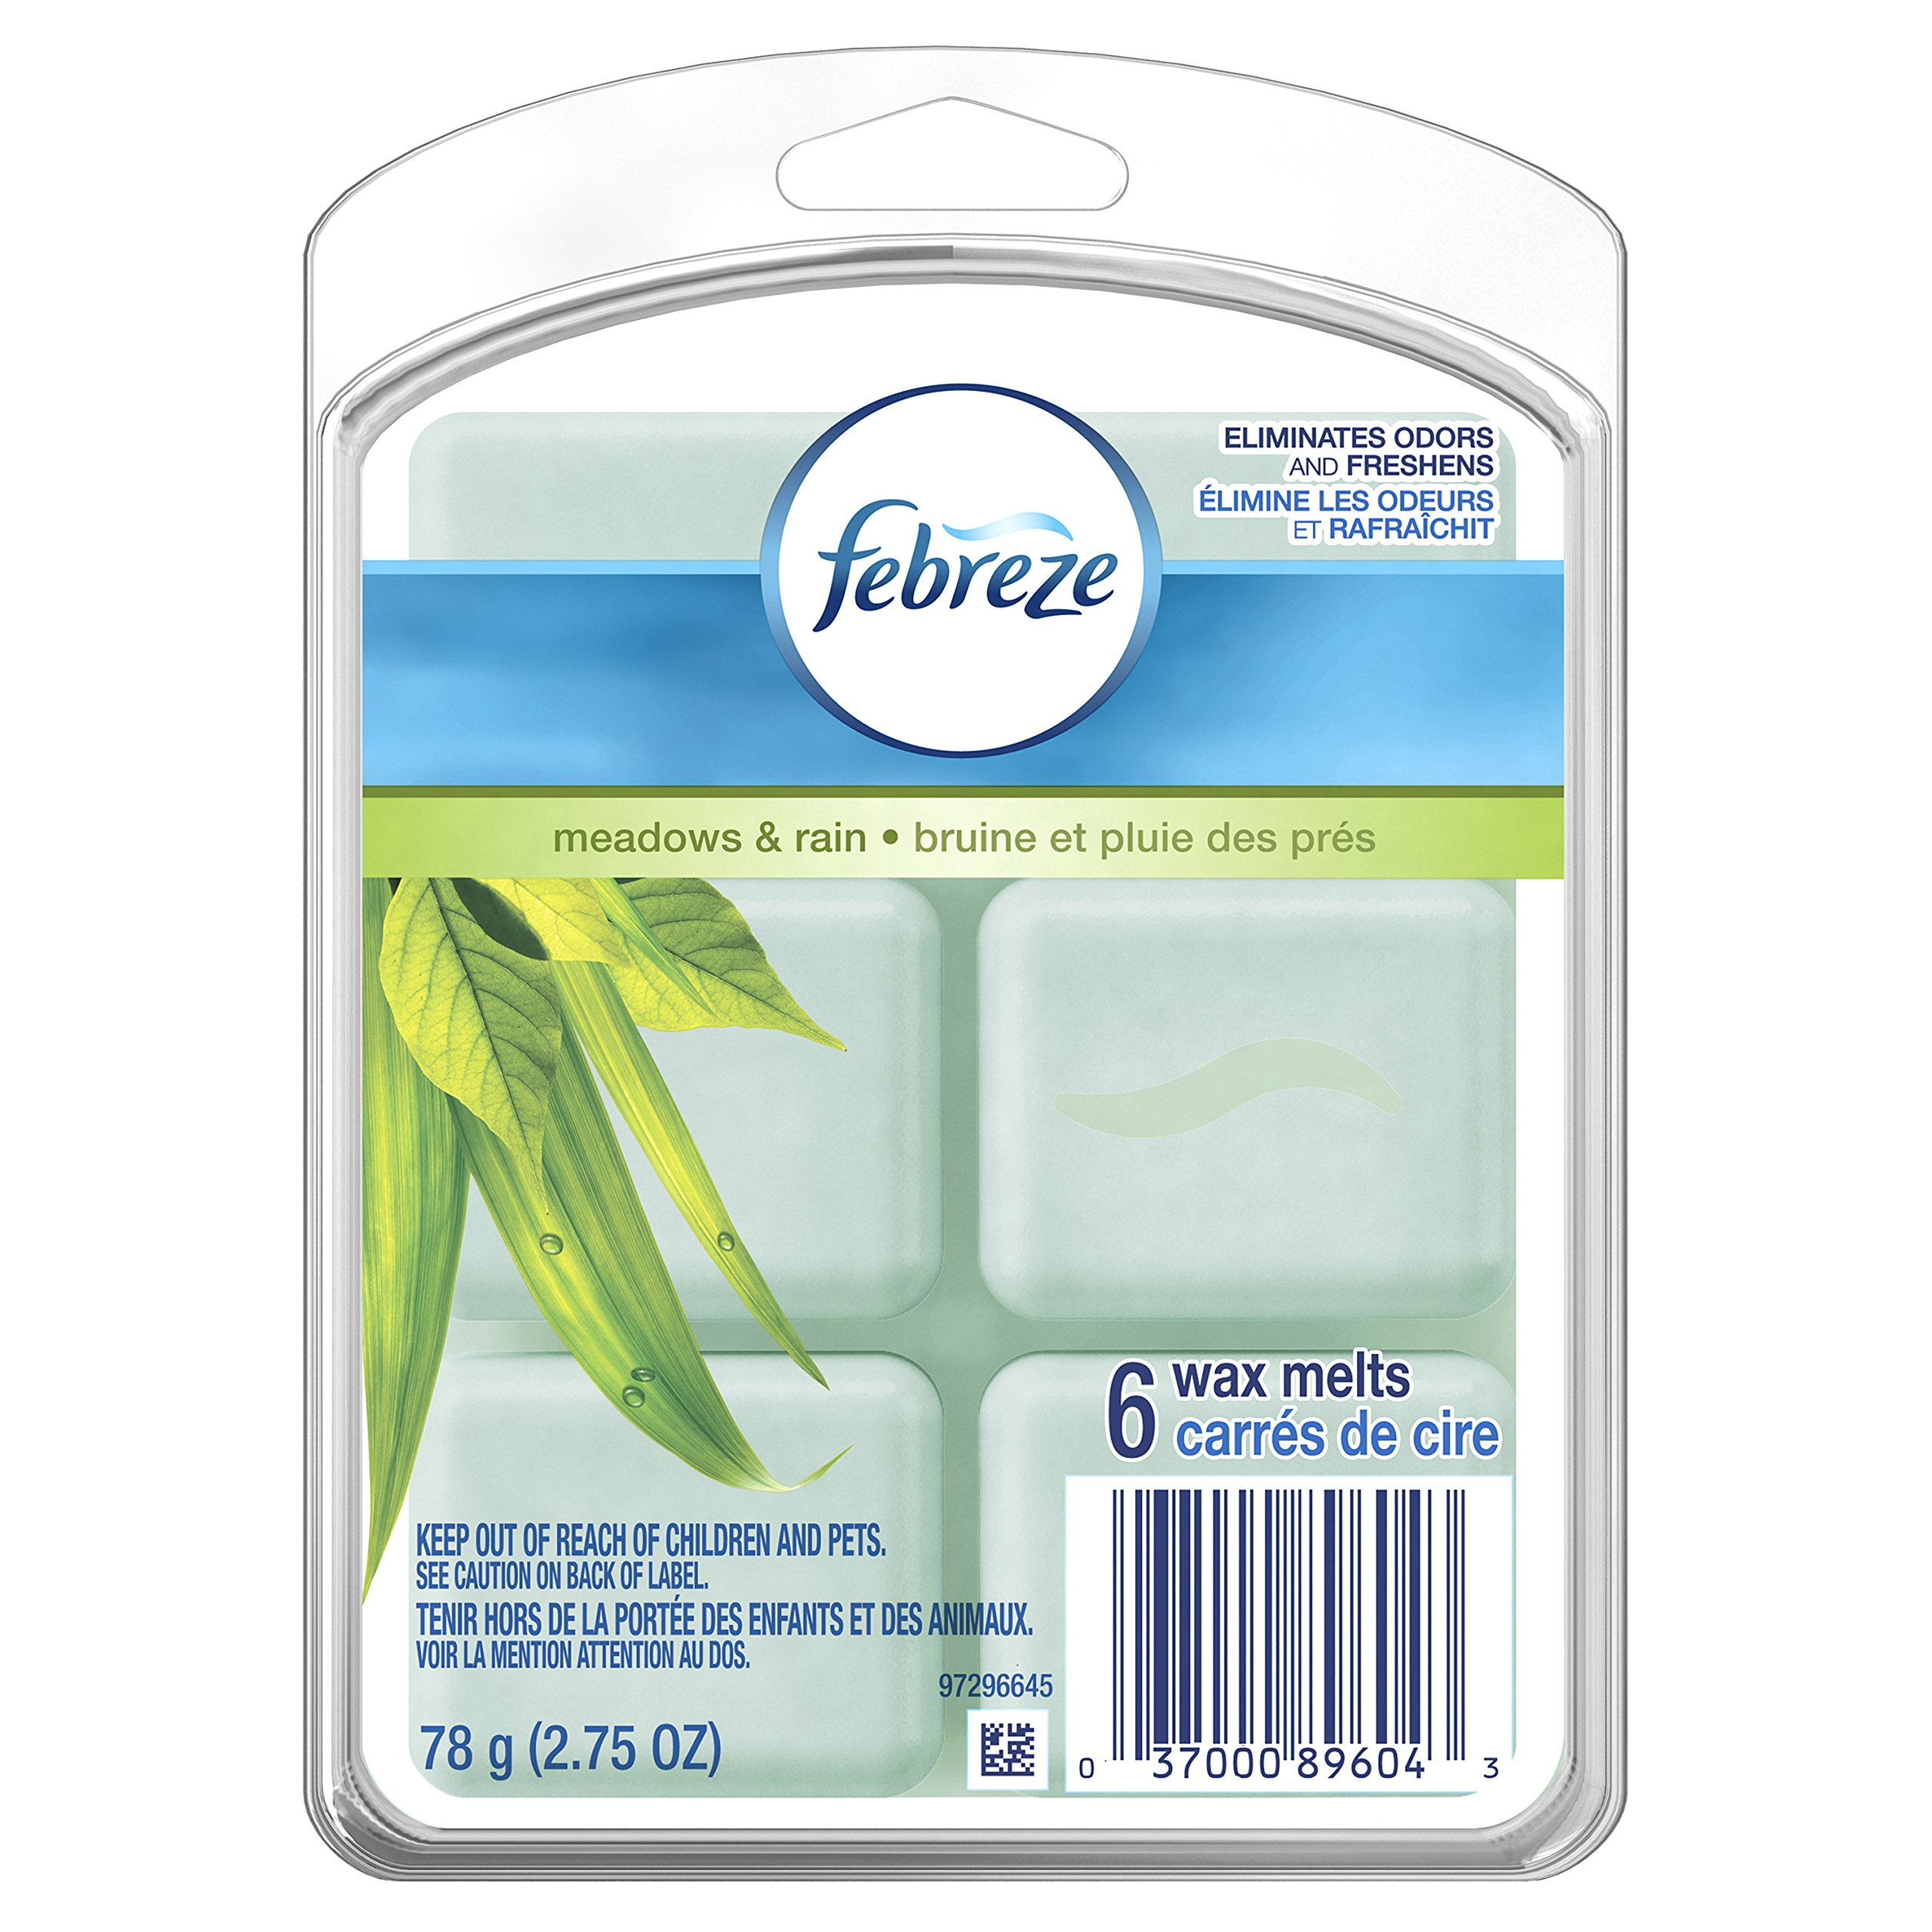 Febreze Wax Melts Air Freshener, Meadows & Rain (Pack of 8)